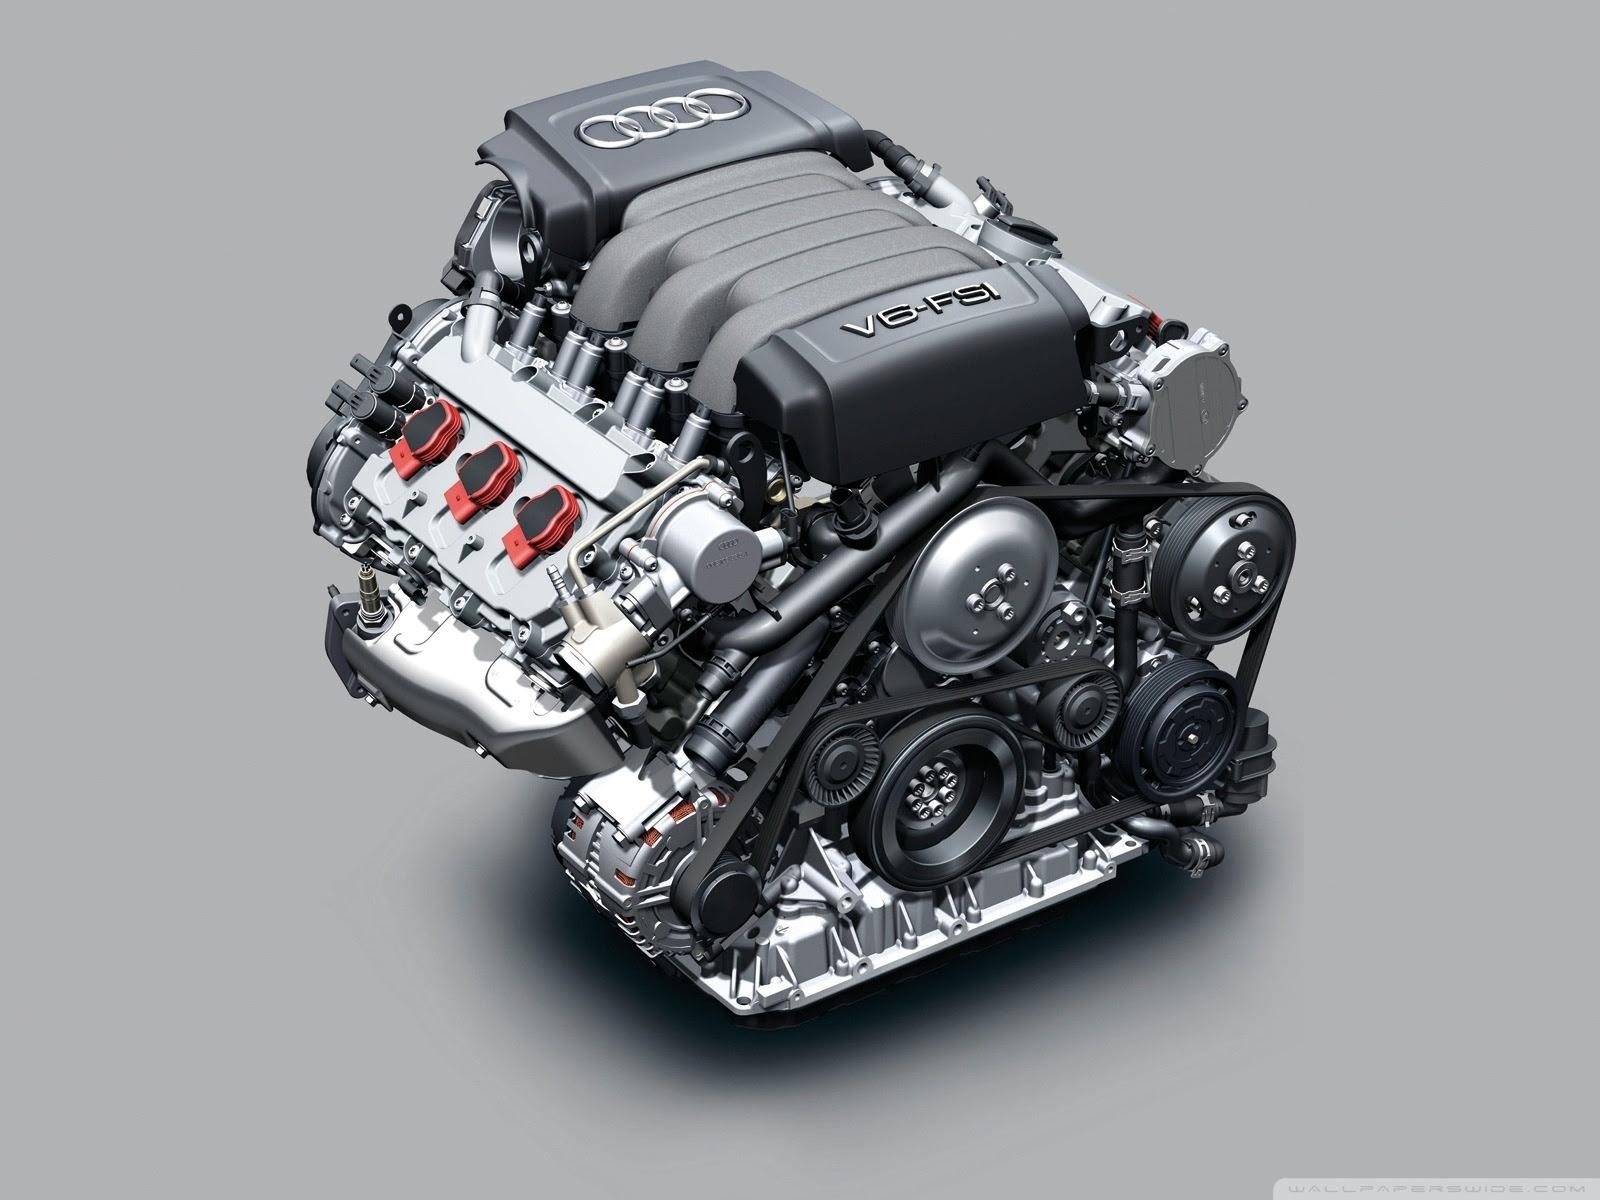 6 0l engine diagram free download image 3